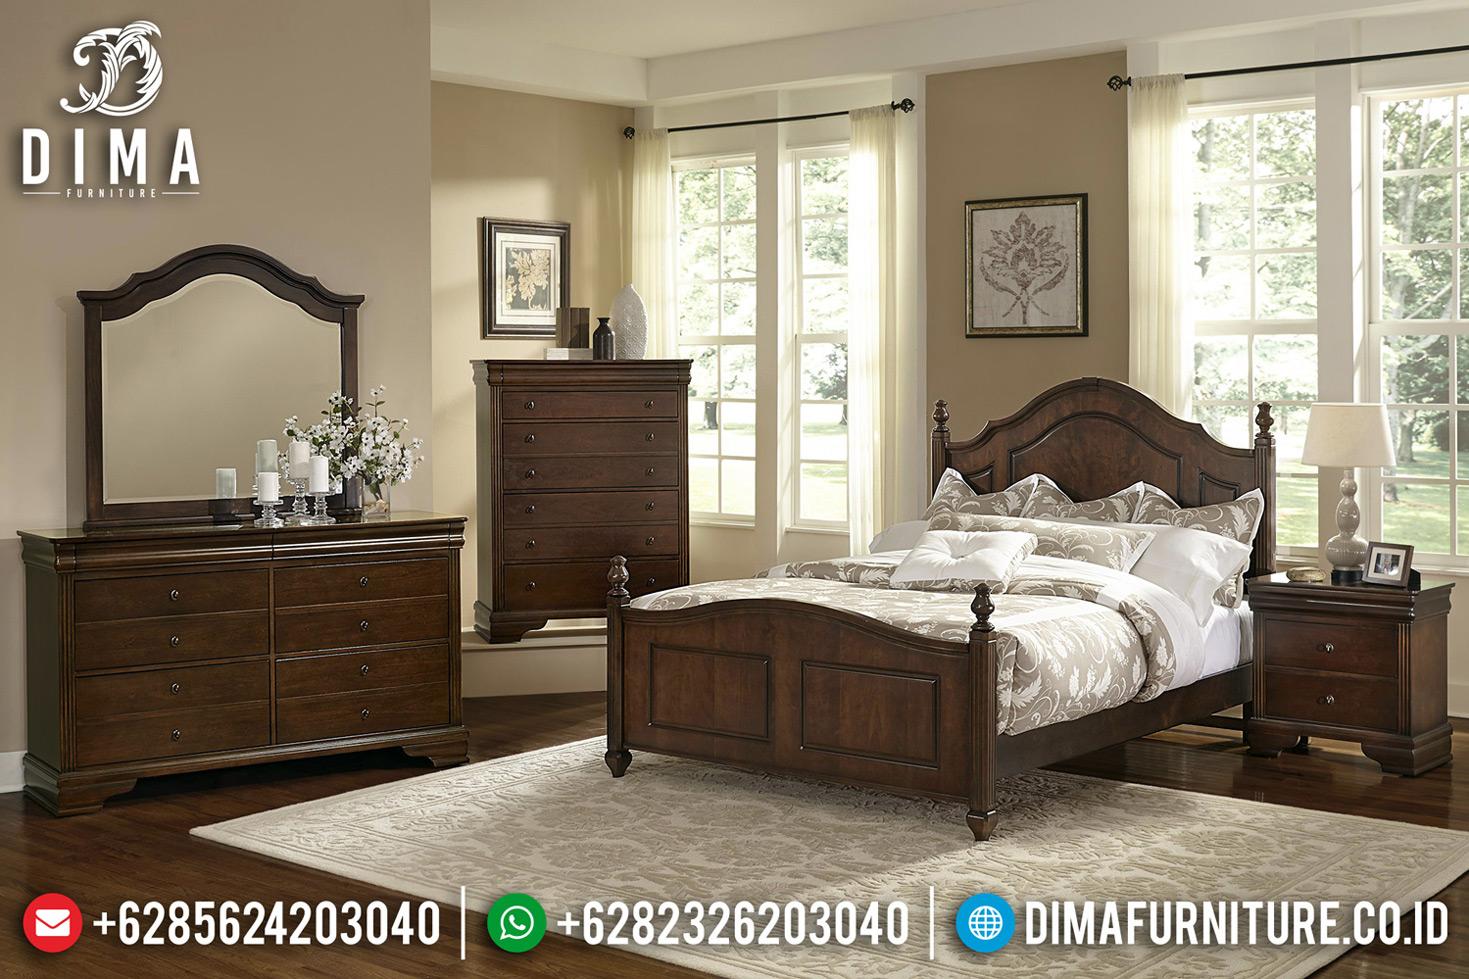 Jual Kamar Set Klasik Minimalis Jati Natural Auburn Glossy BT-0673